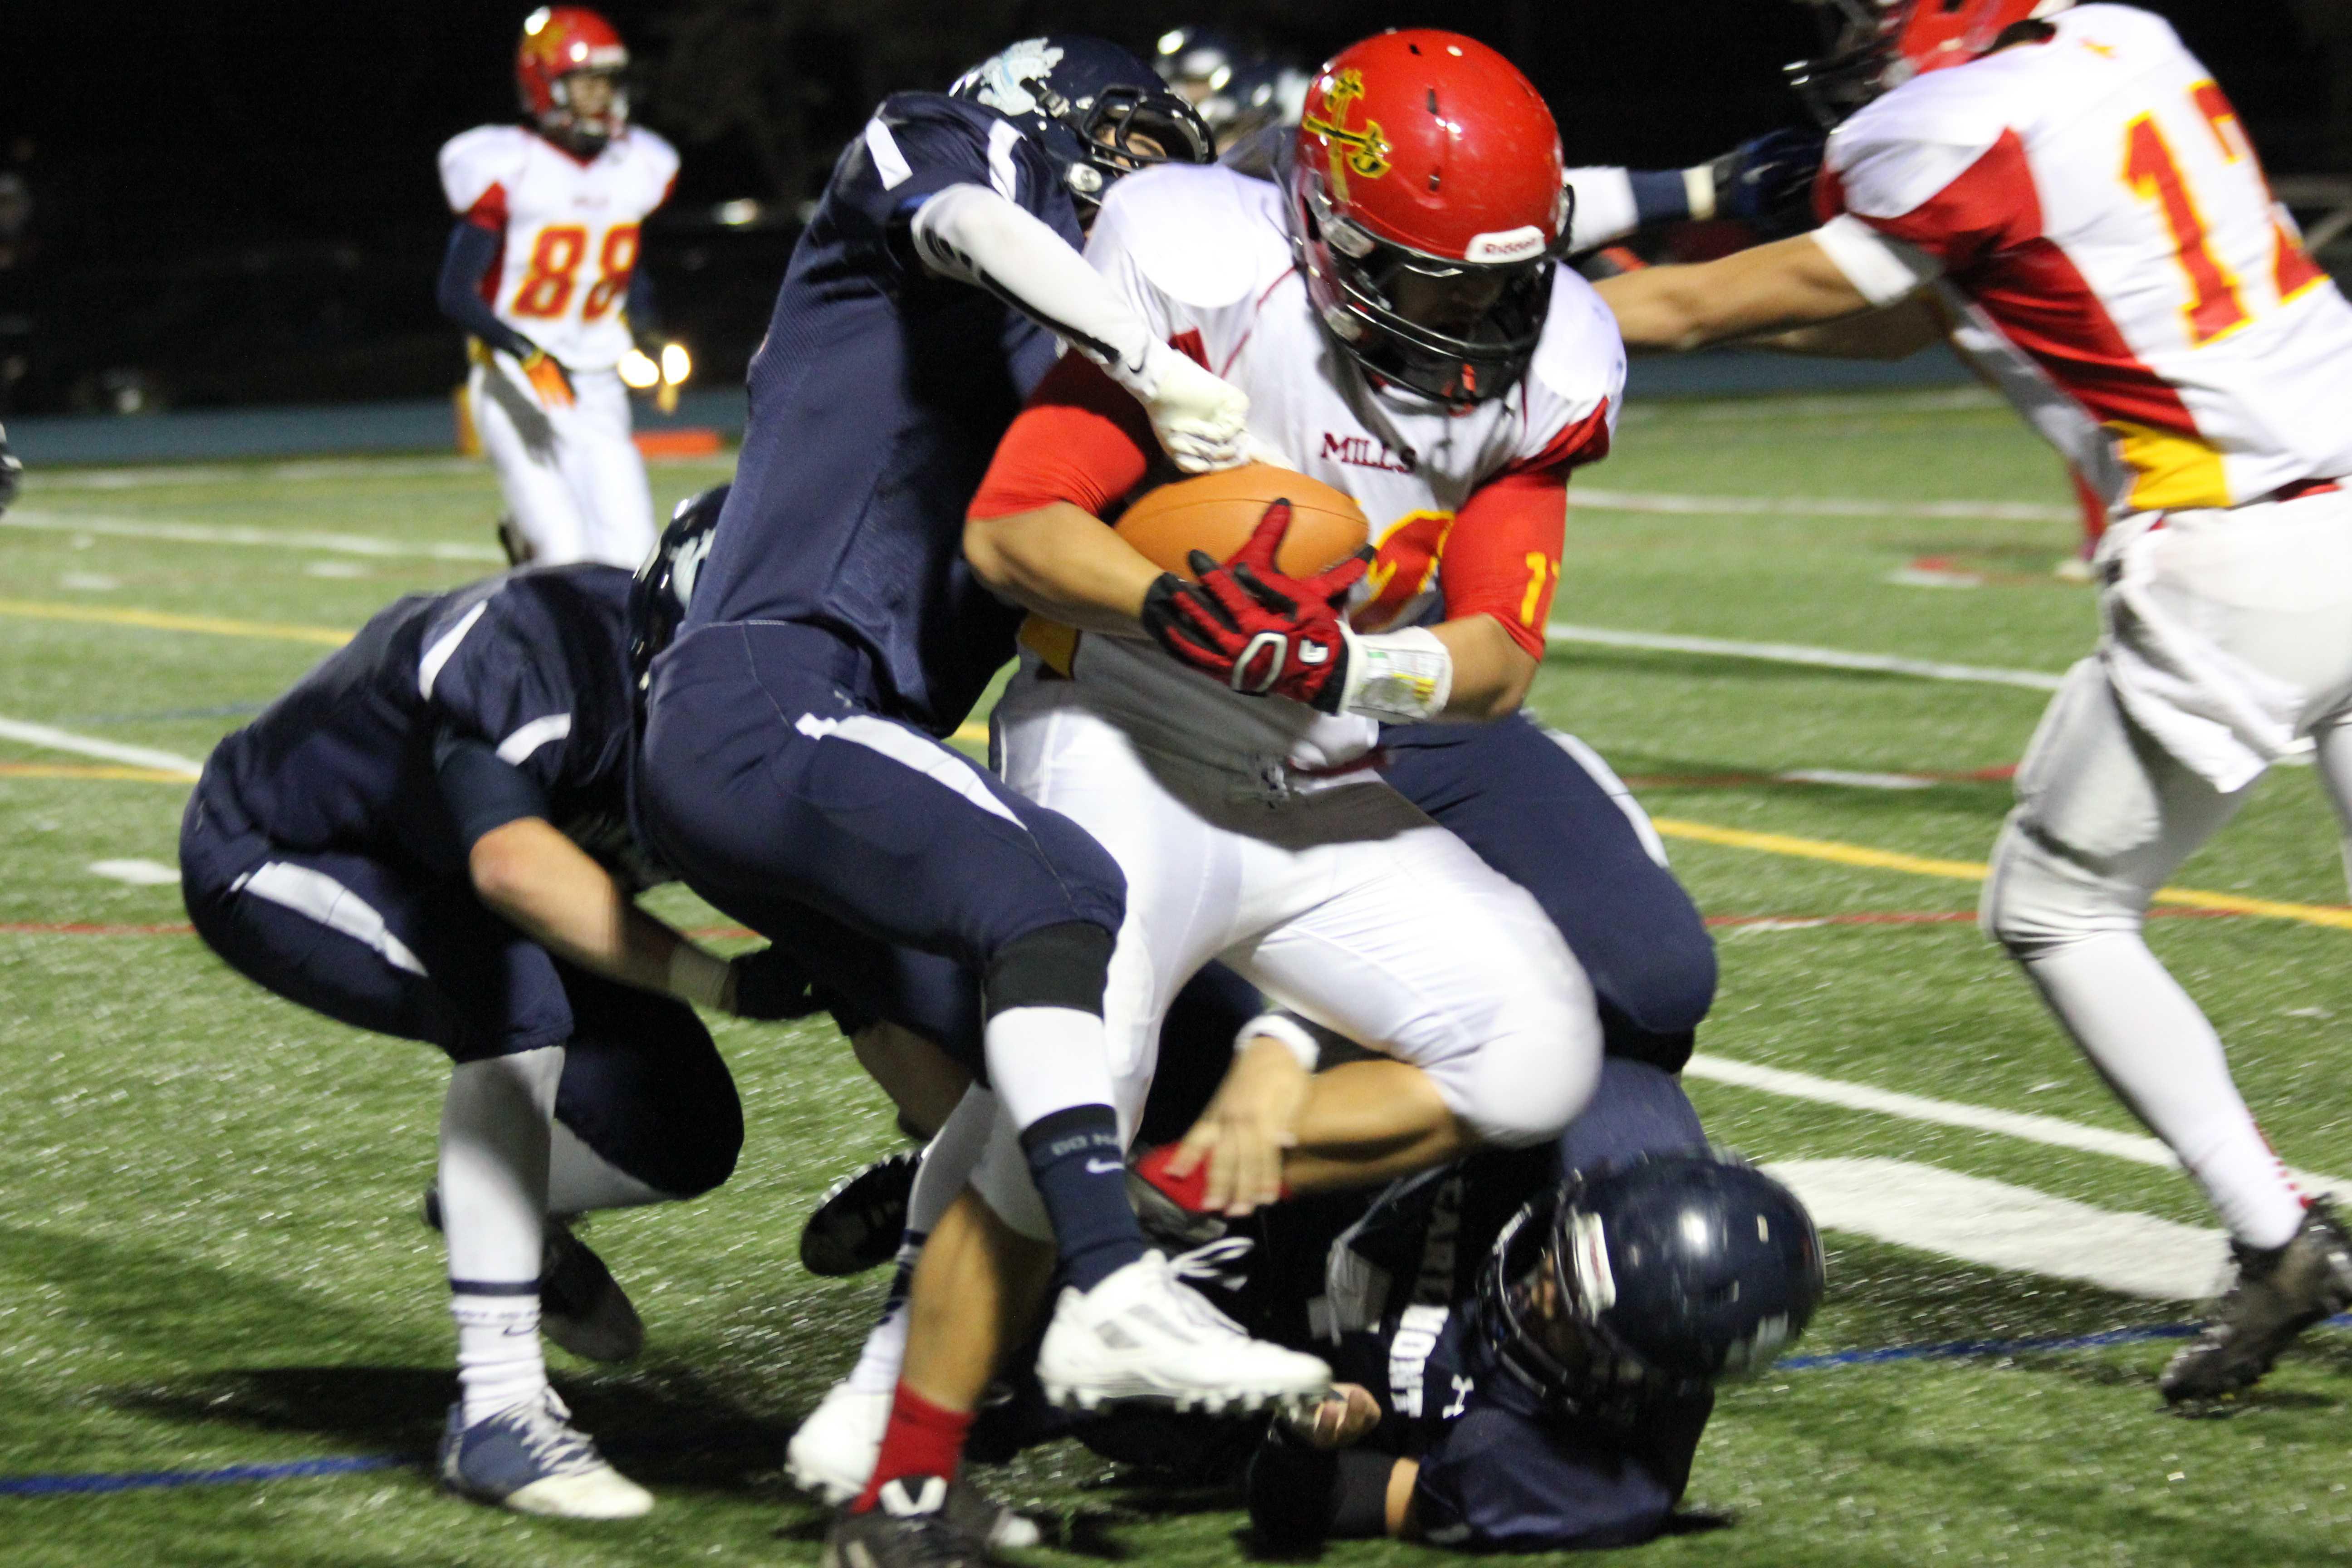 Varsity Football puts up a defensive battle against Mills